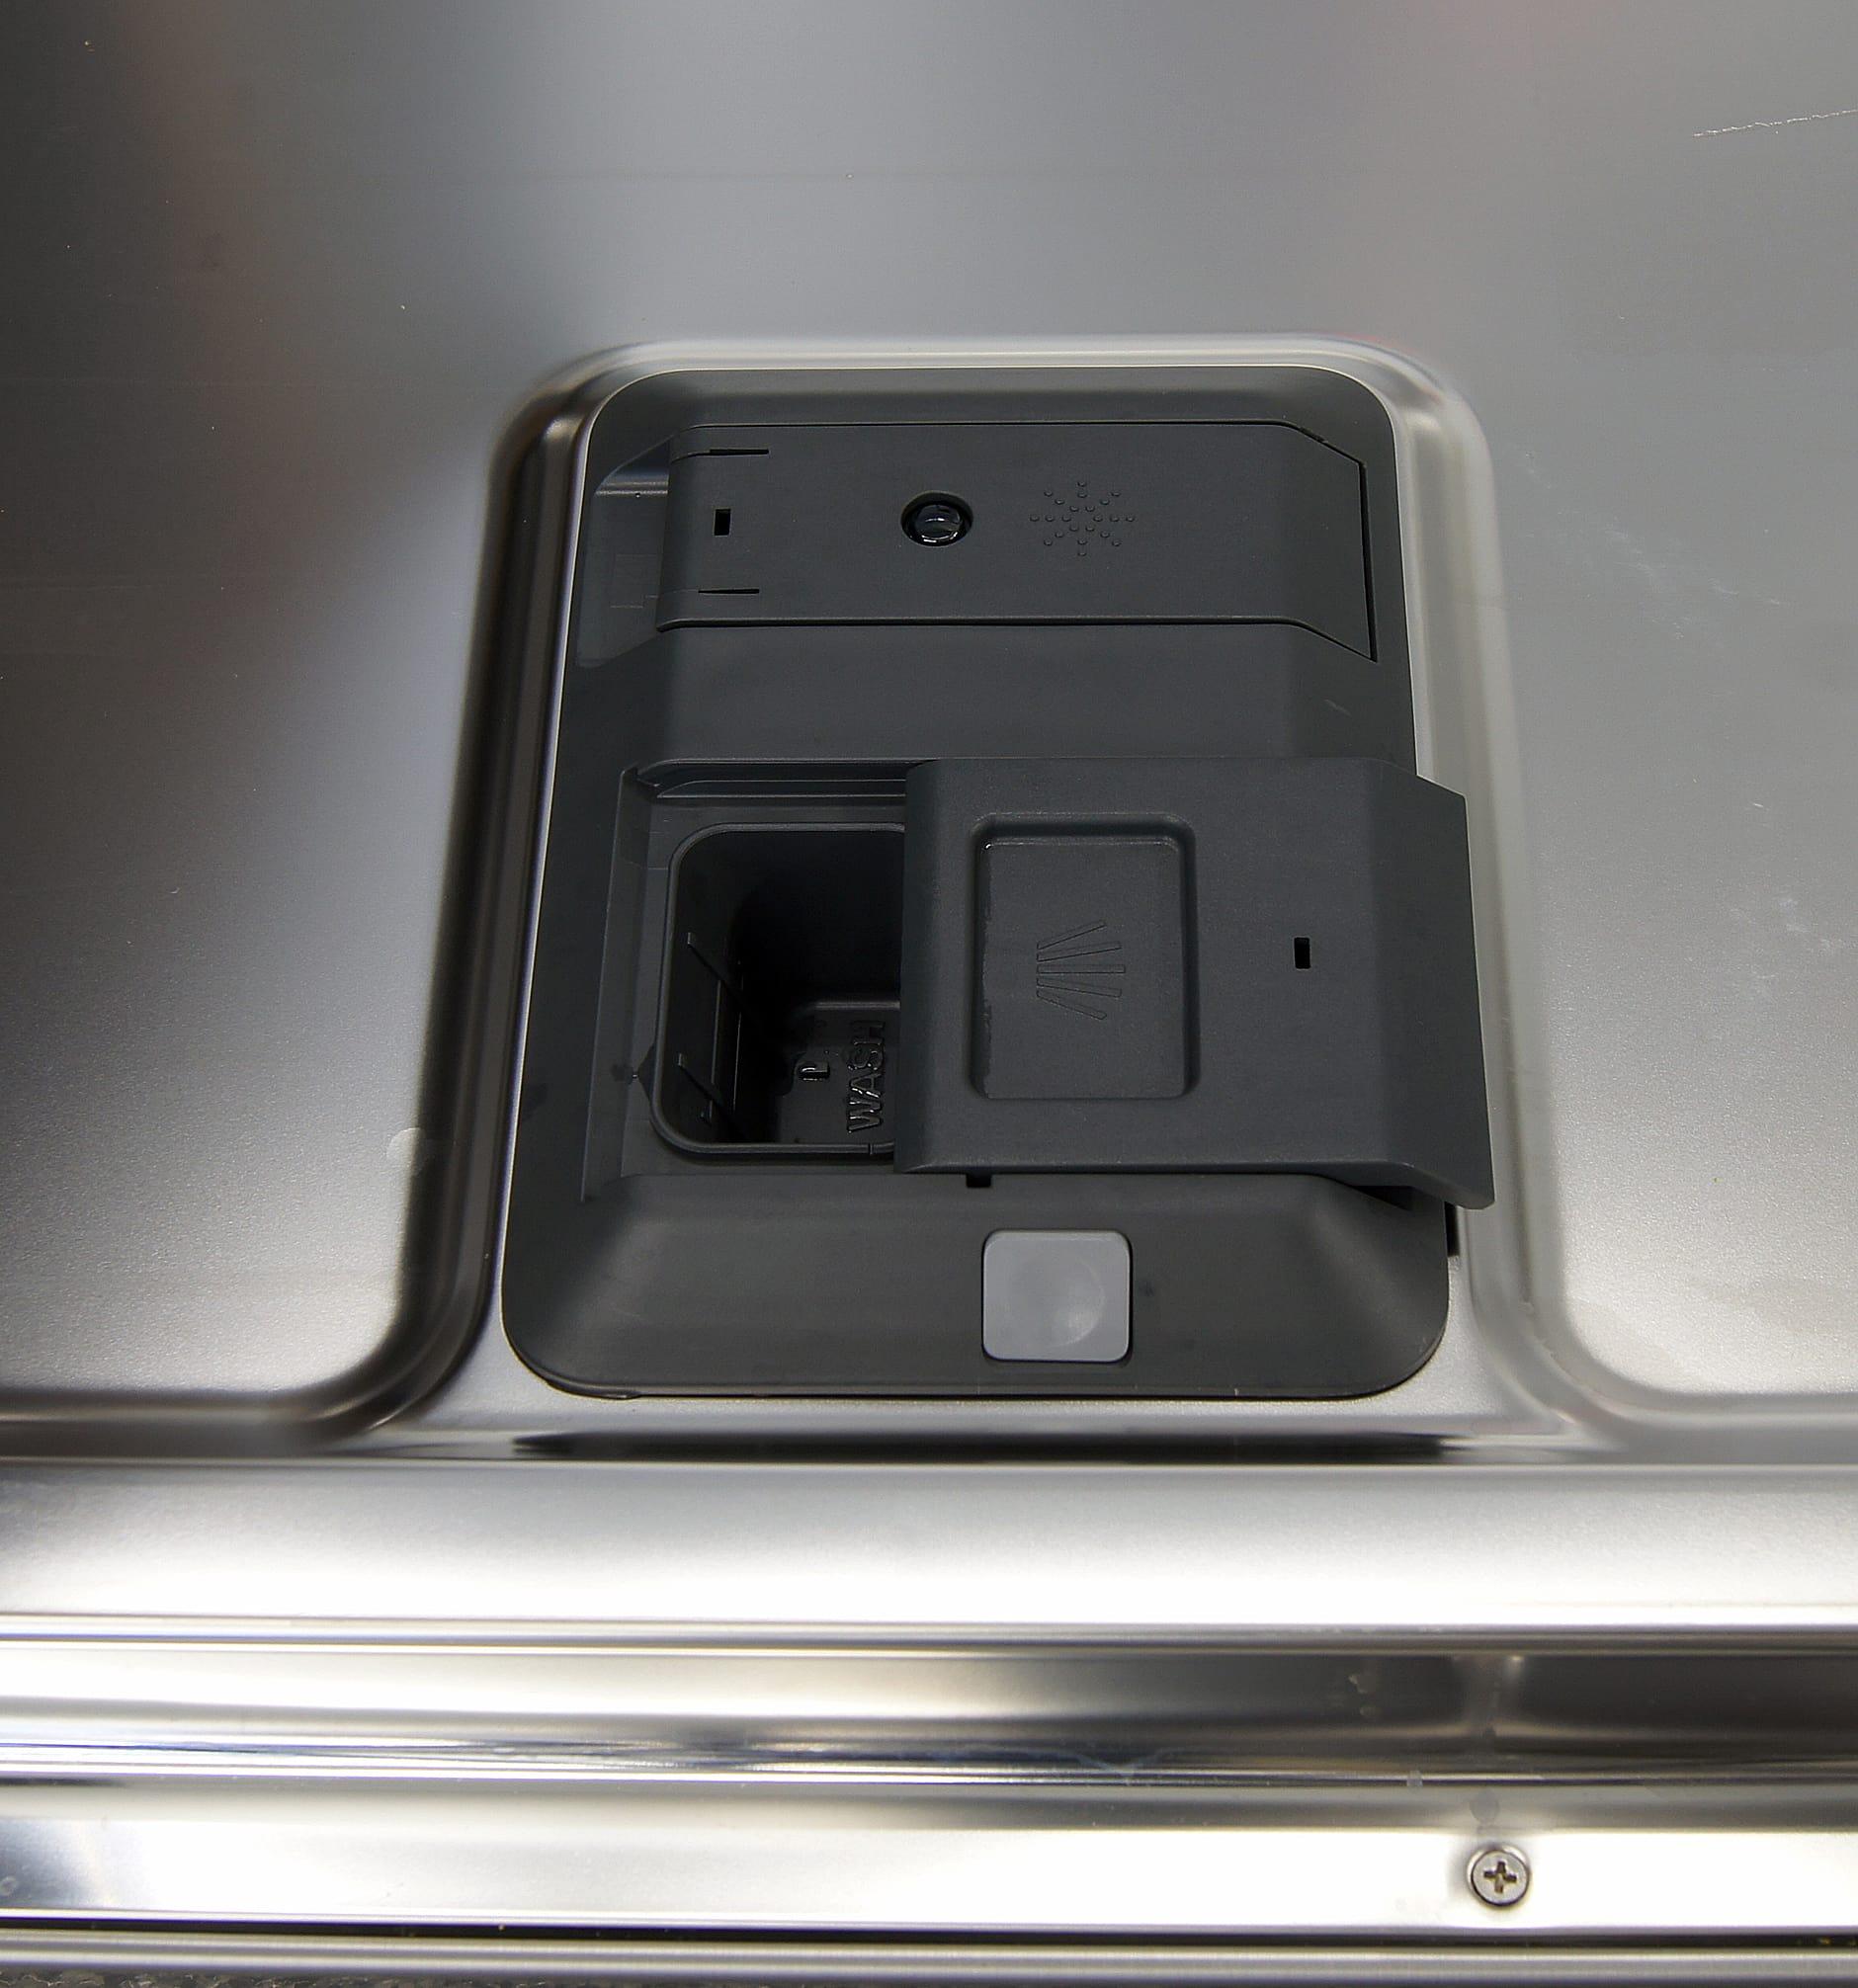 Frigidaire Gallery FGID2474QS detergent and rinse aid dispenser